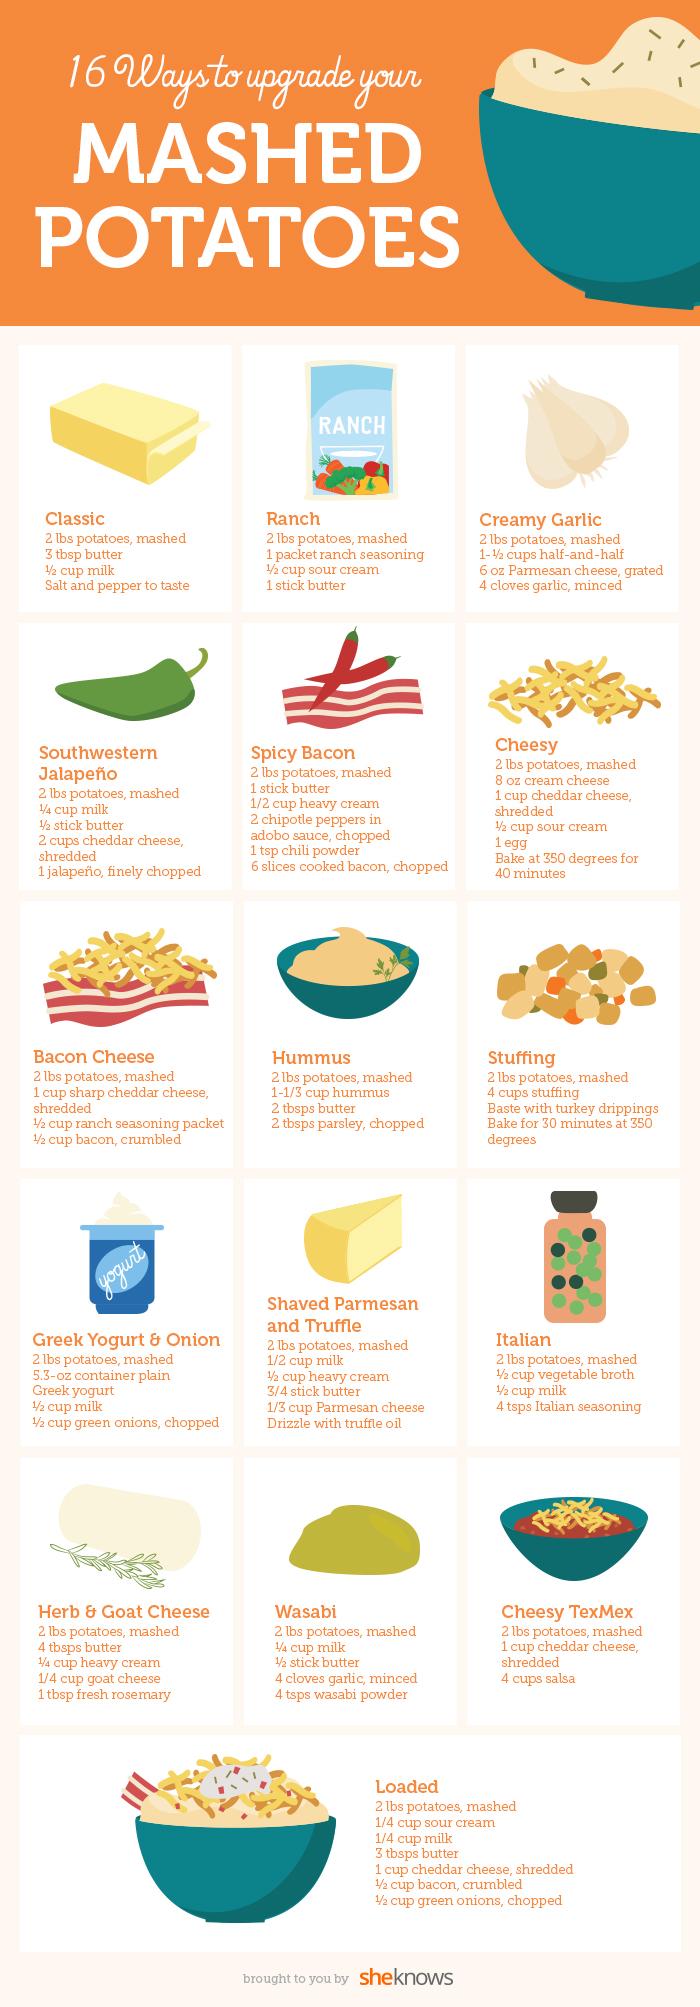 Mashed potato recipes